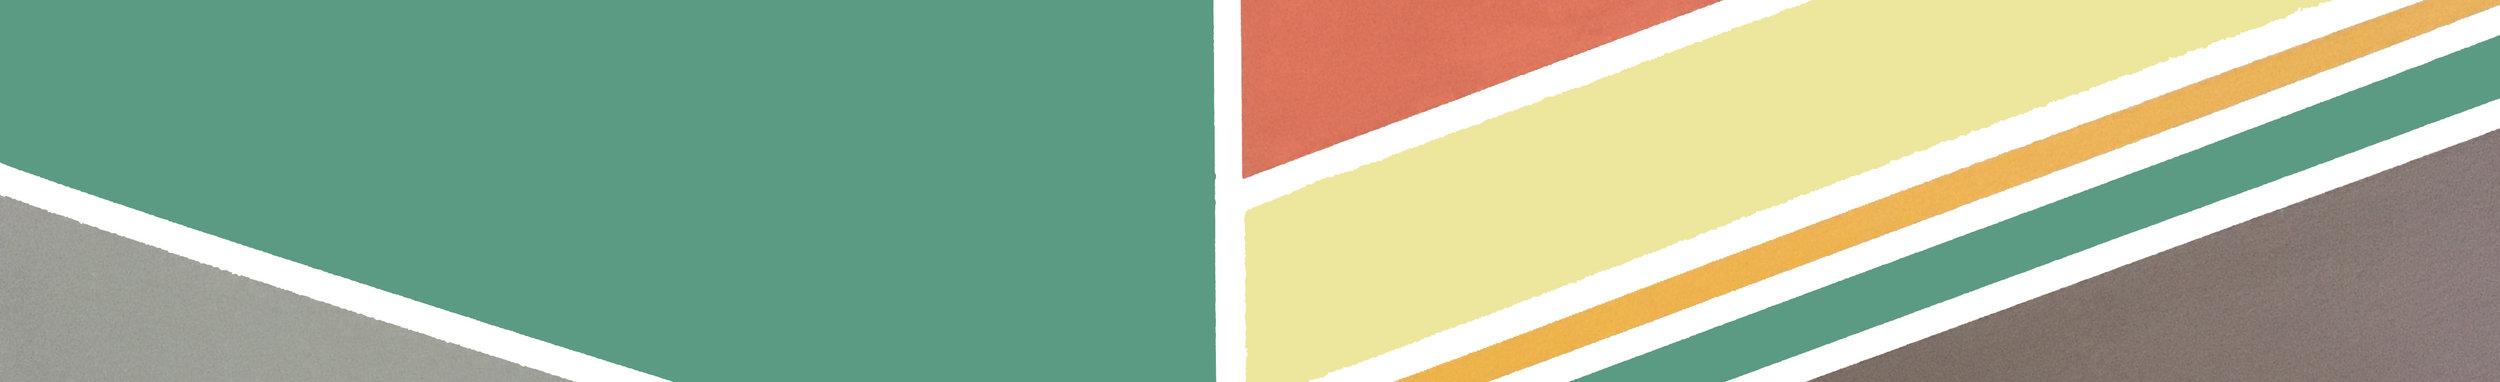 Wall pattern_Bright.jpg